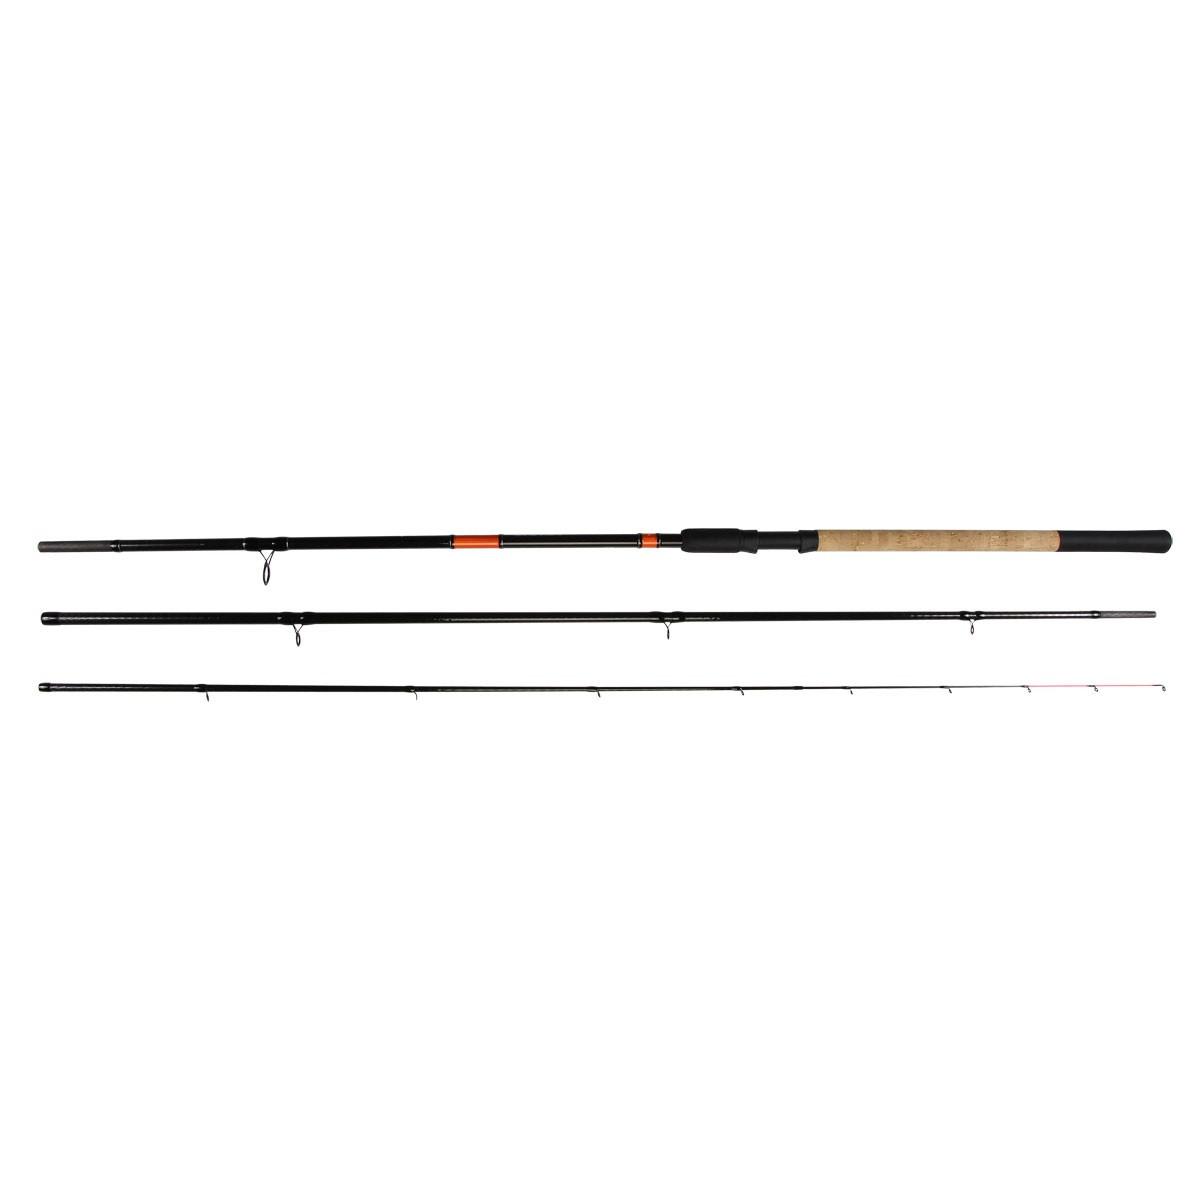 Спиннинг GC Onnex River Feeder 3.90м 120гр NEW 2020